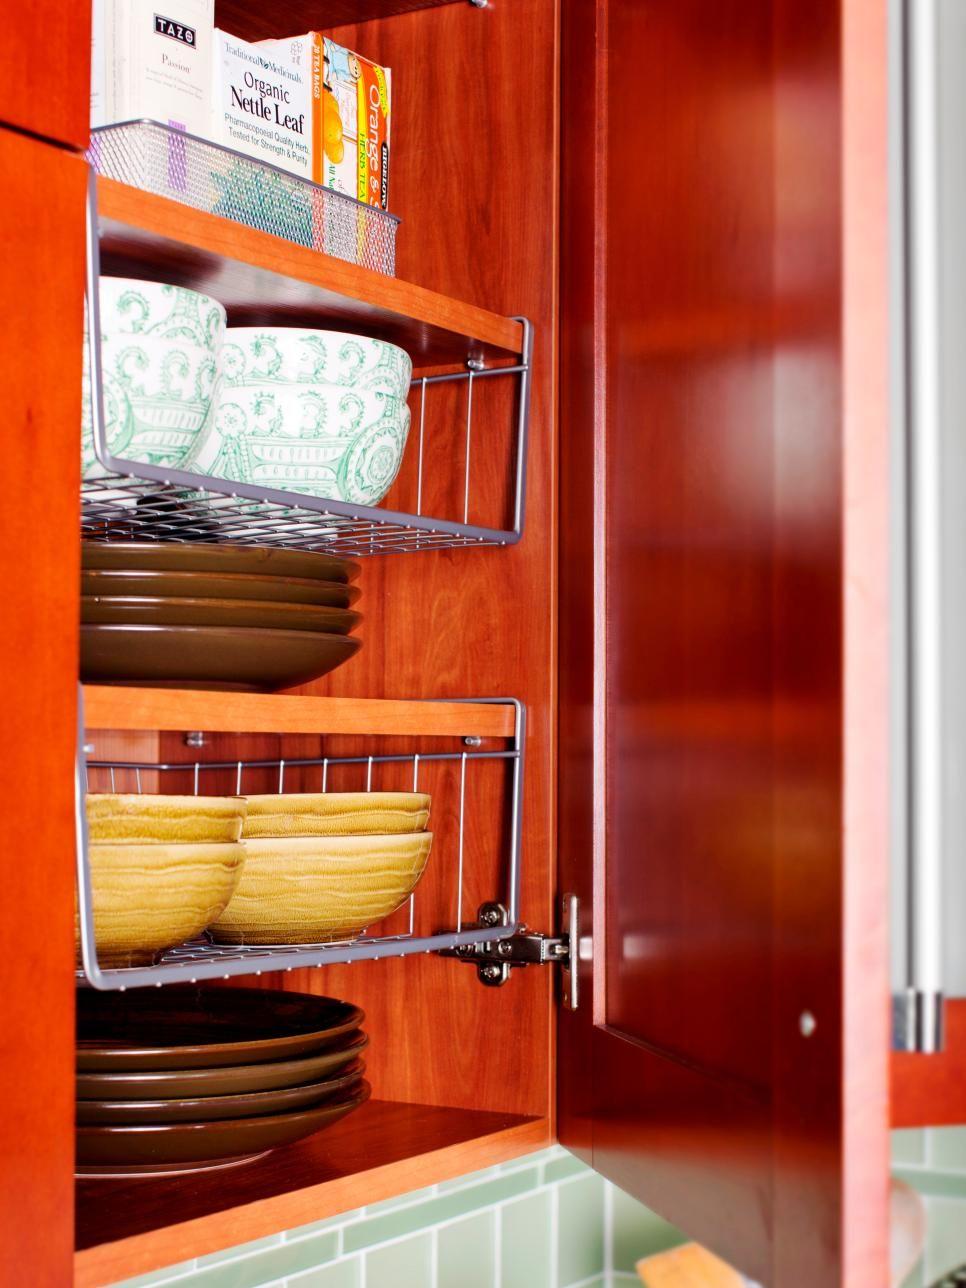 29 Clever Ways to Keep Your Kitchen Organized | Organization Ideas ...